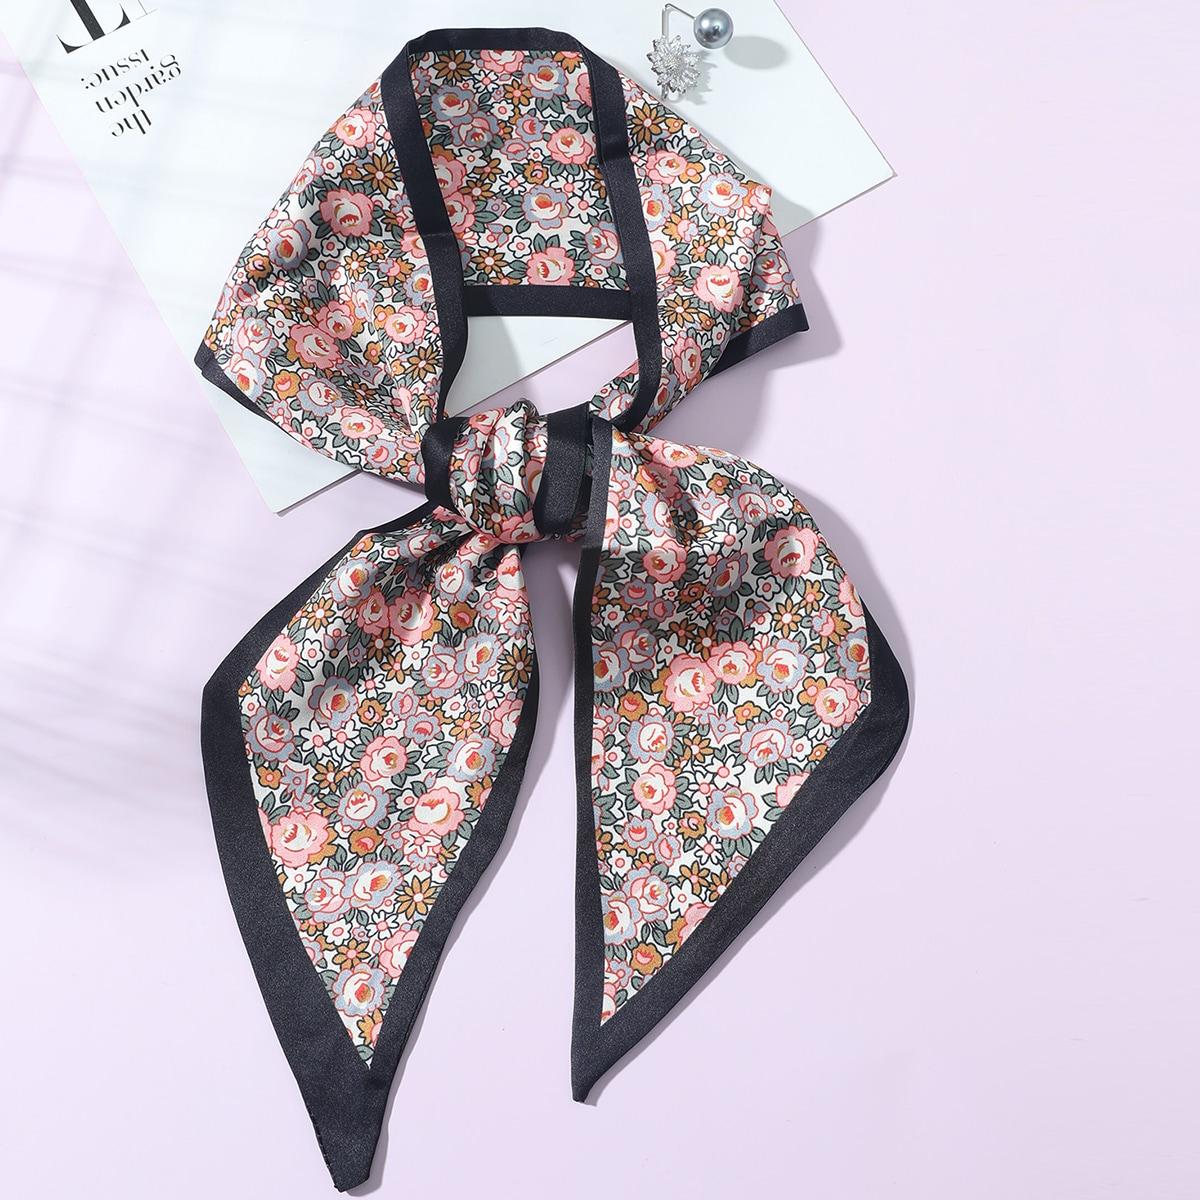 SHEIN Skinny sjaal met bloemenprint